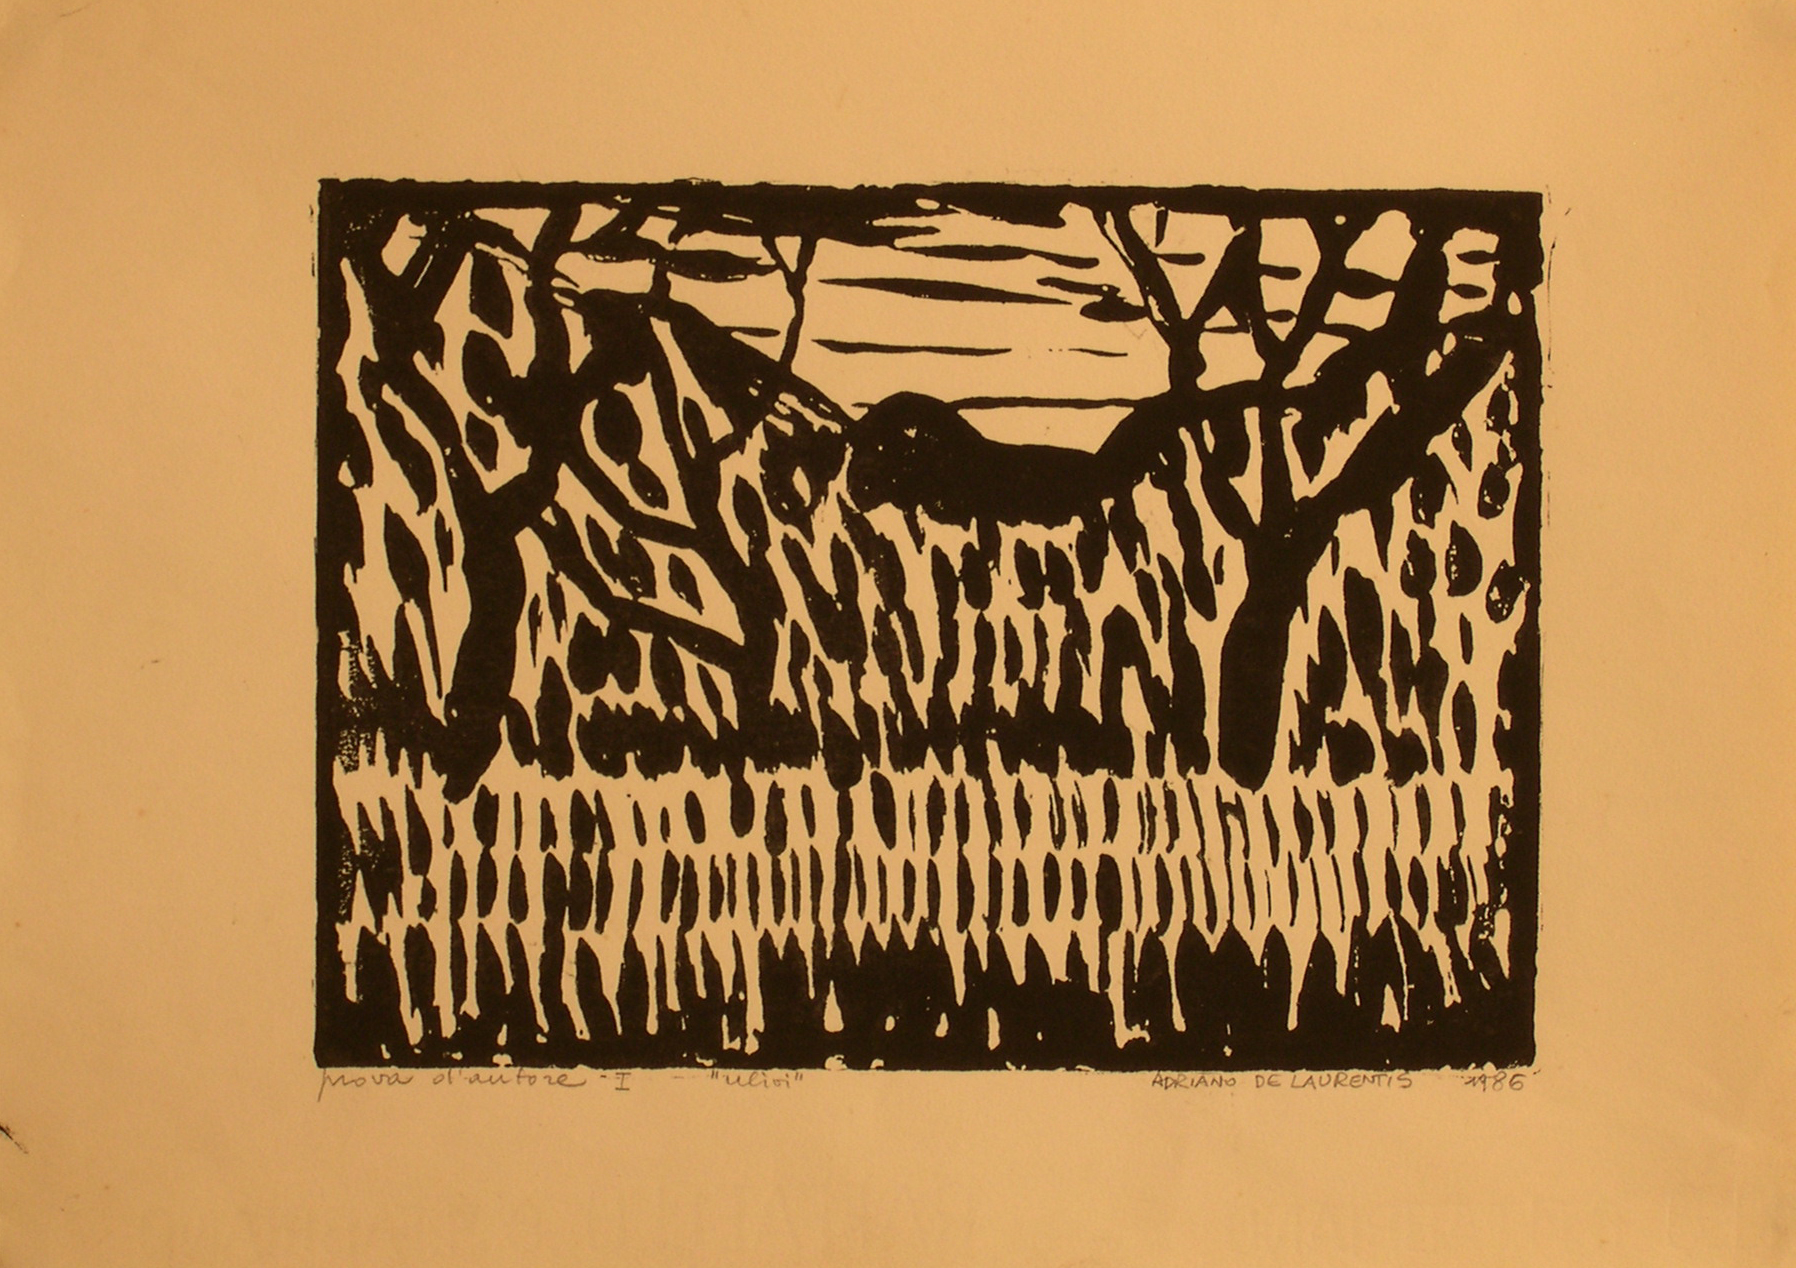 Ulivi - Prova d'autore 1 - 1986 - Stampa Linoleum su Carta - 24x33